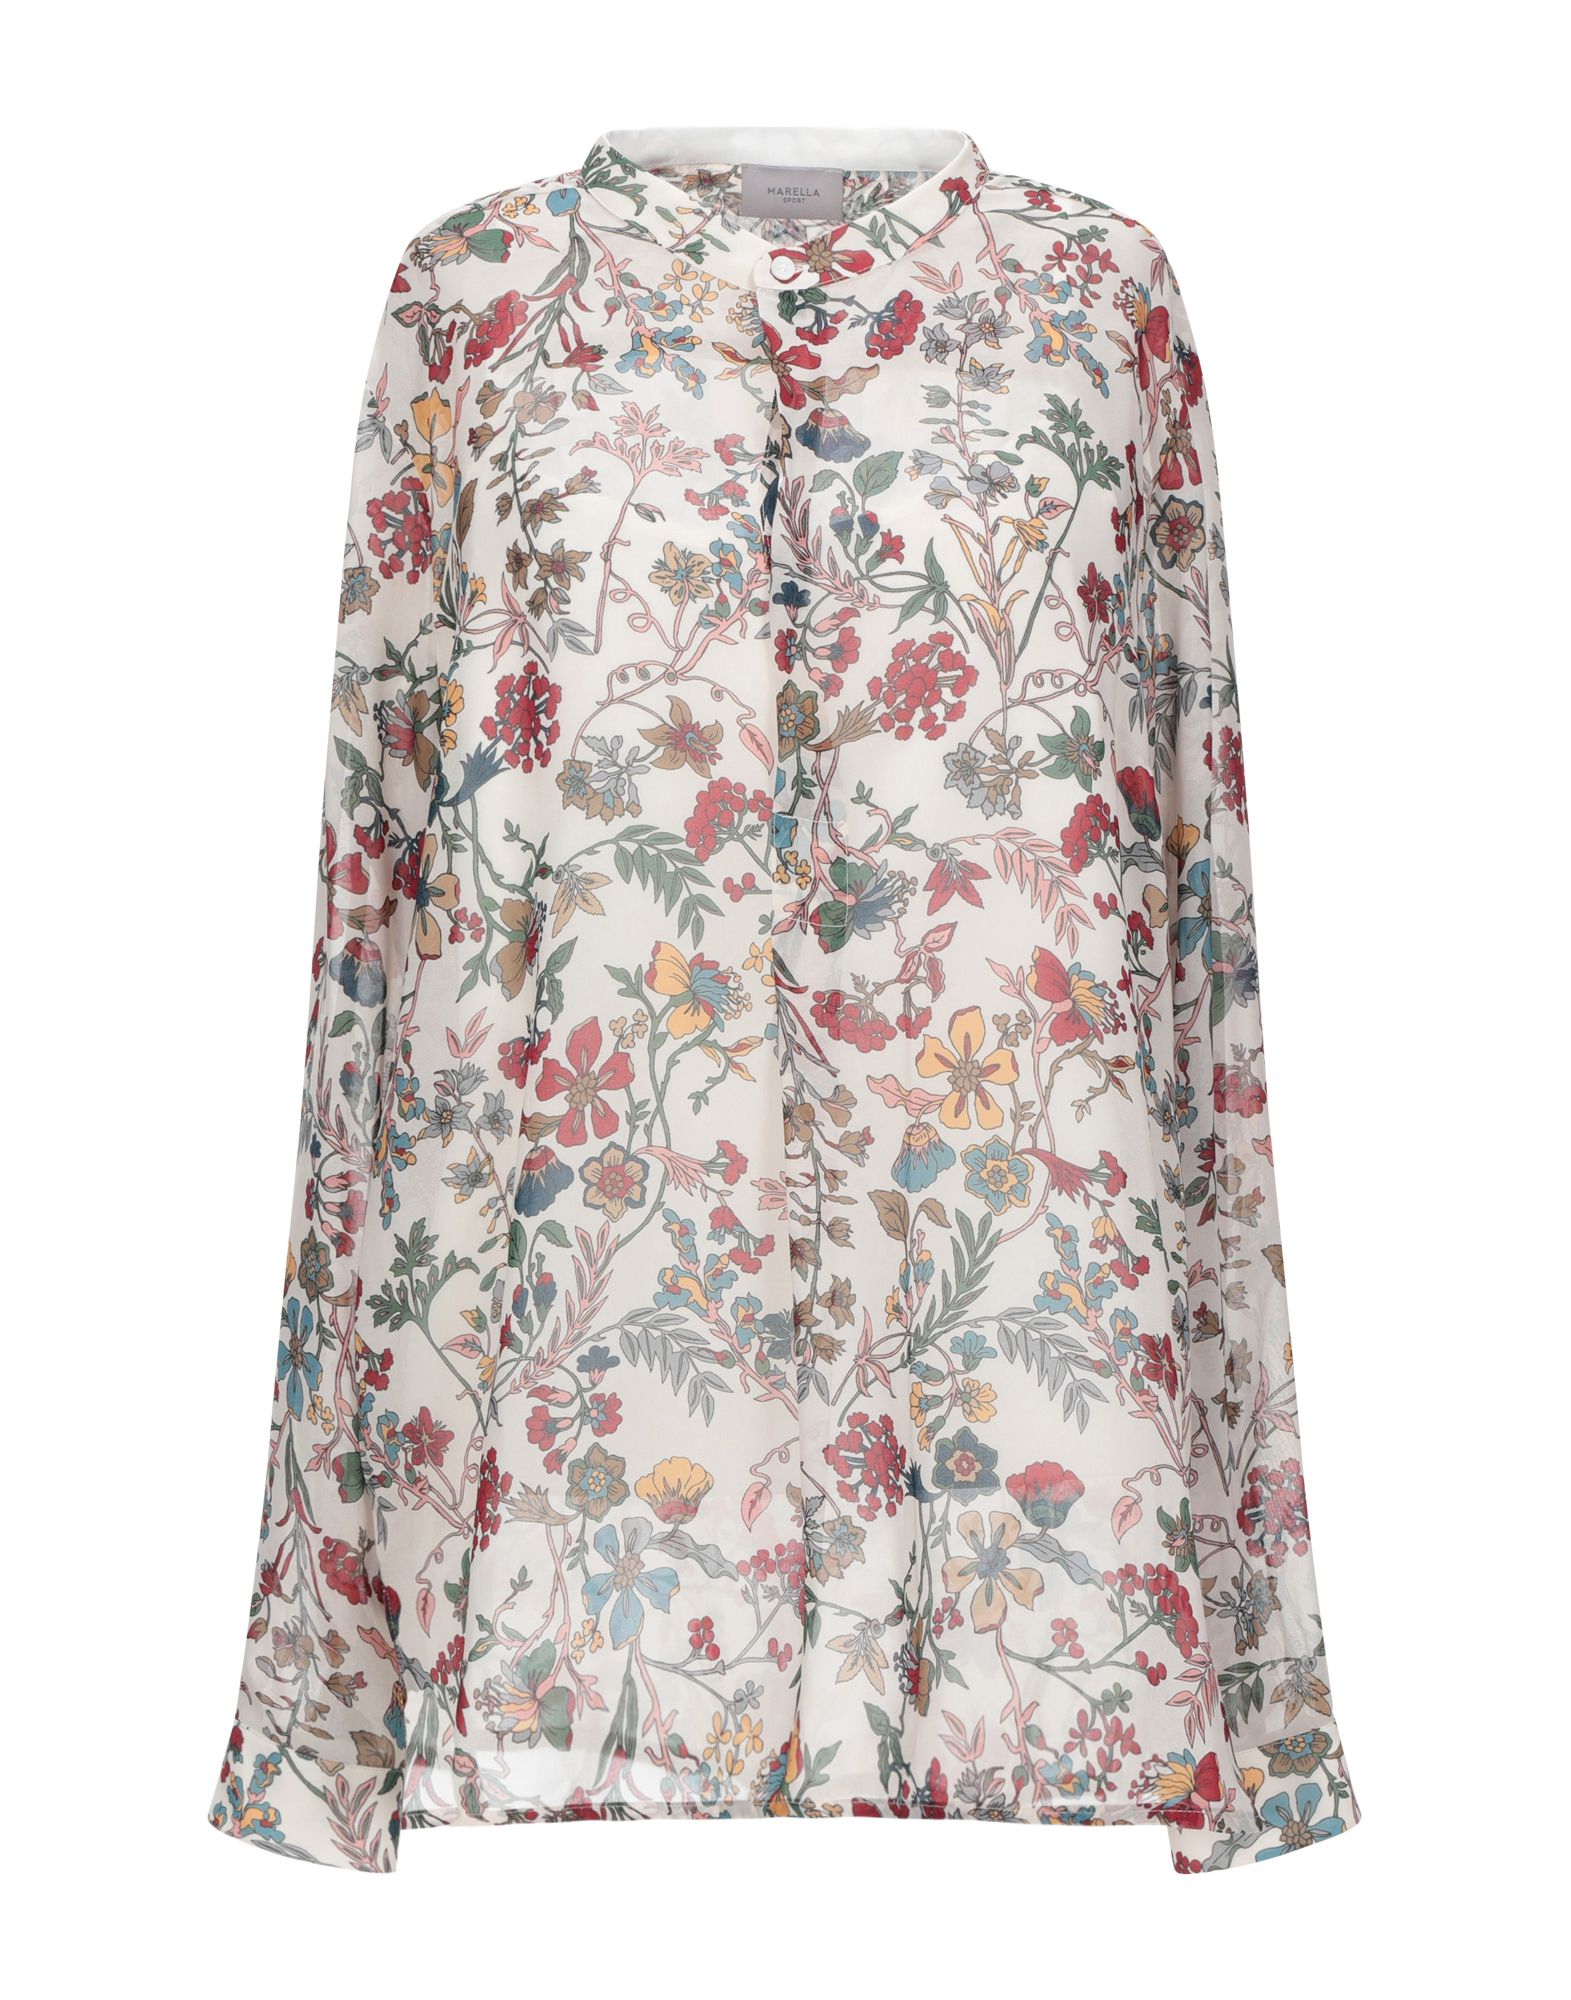 Фото - MARELLA SPORT Блузка marella sport блузка